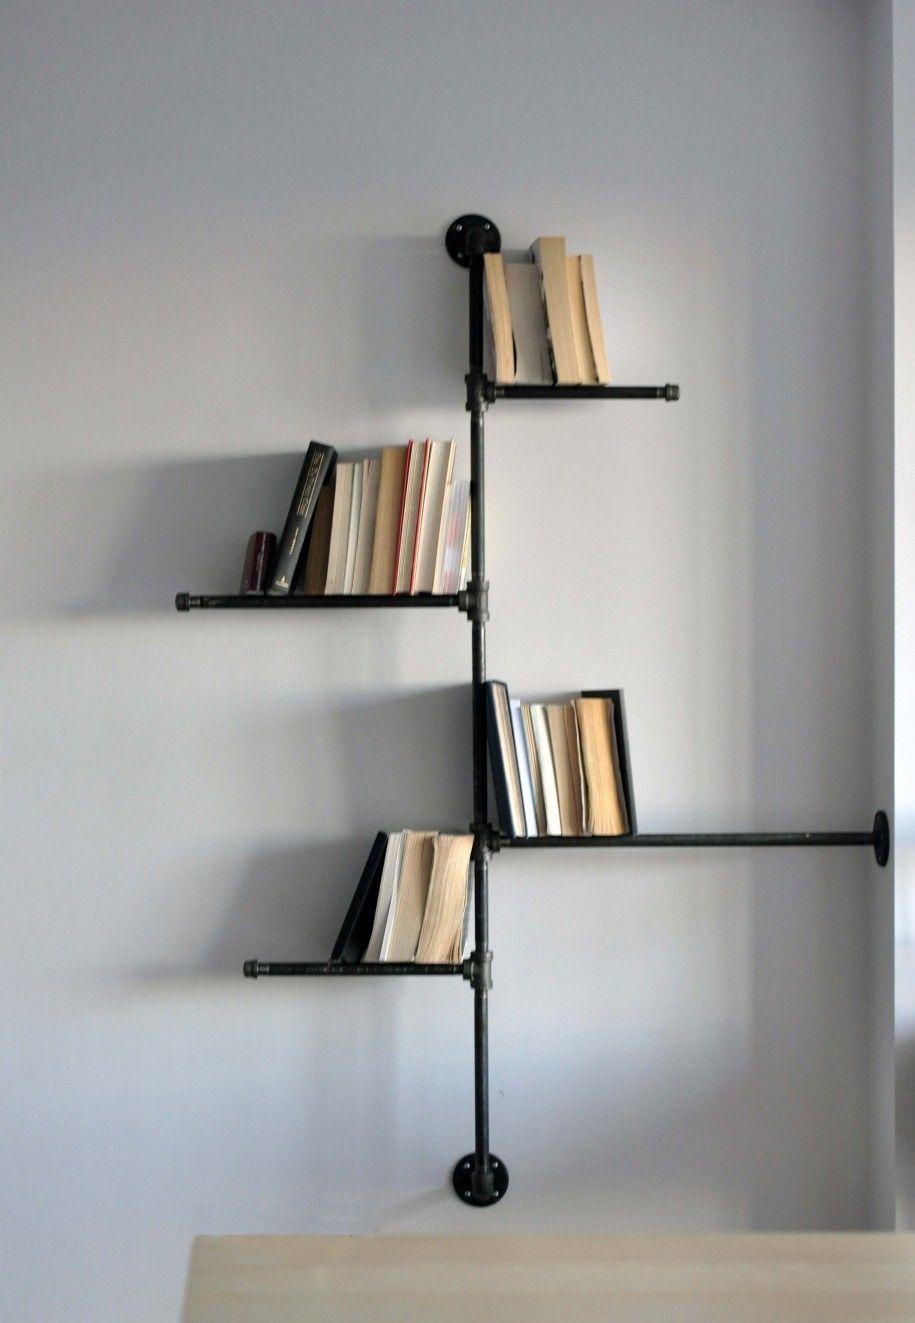 ikea hanging hwy billy hackers bookcase horizontal bookshelves floating american